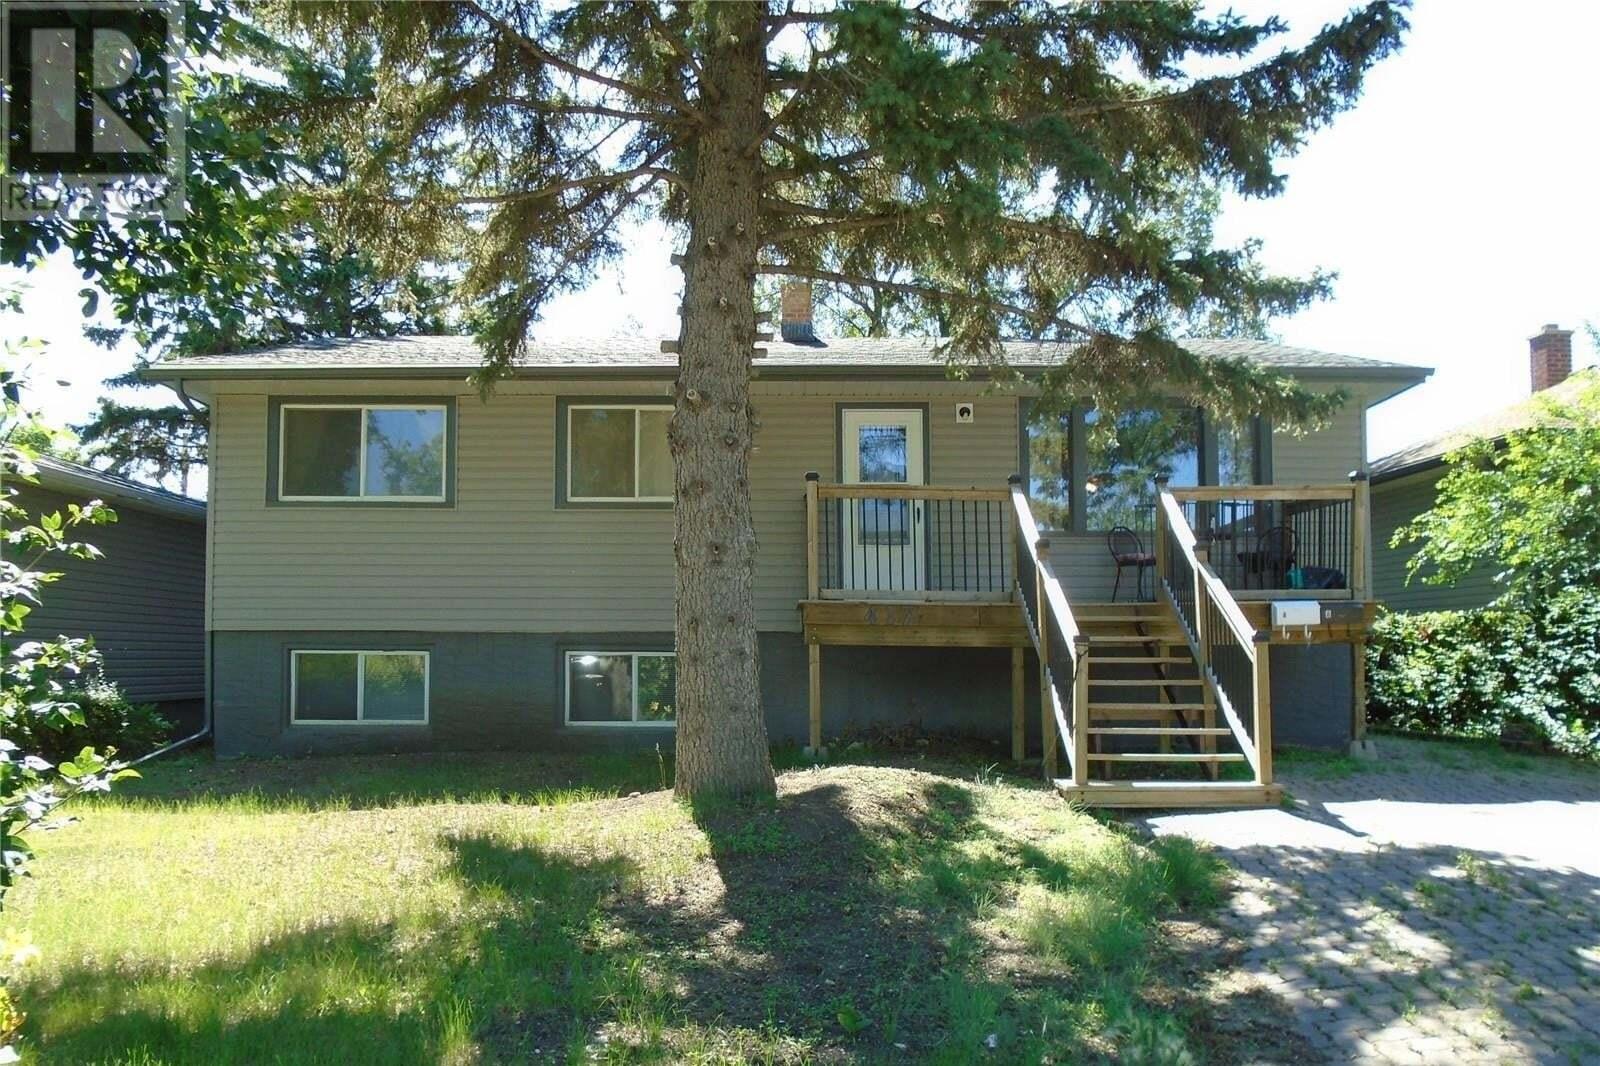 House for sale at 417 17th Ave E Regina Saskatchewan - MLS: SK818986